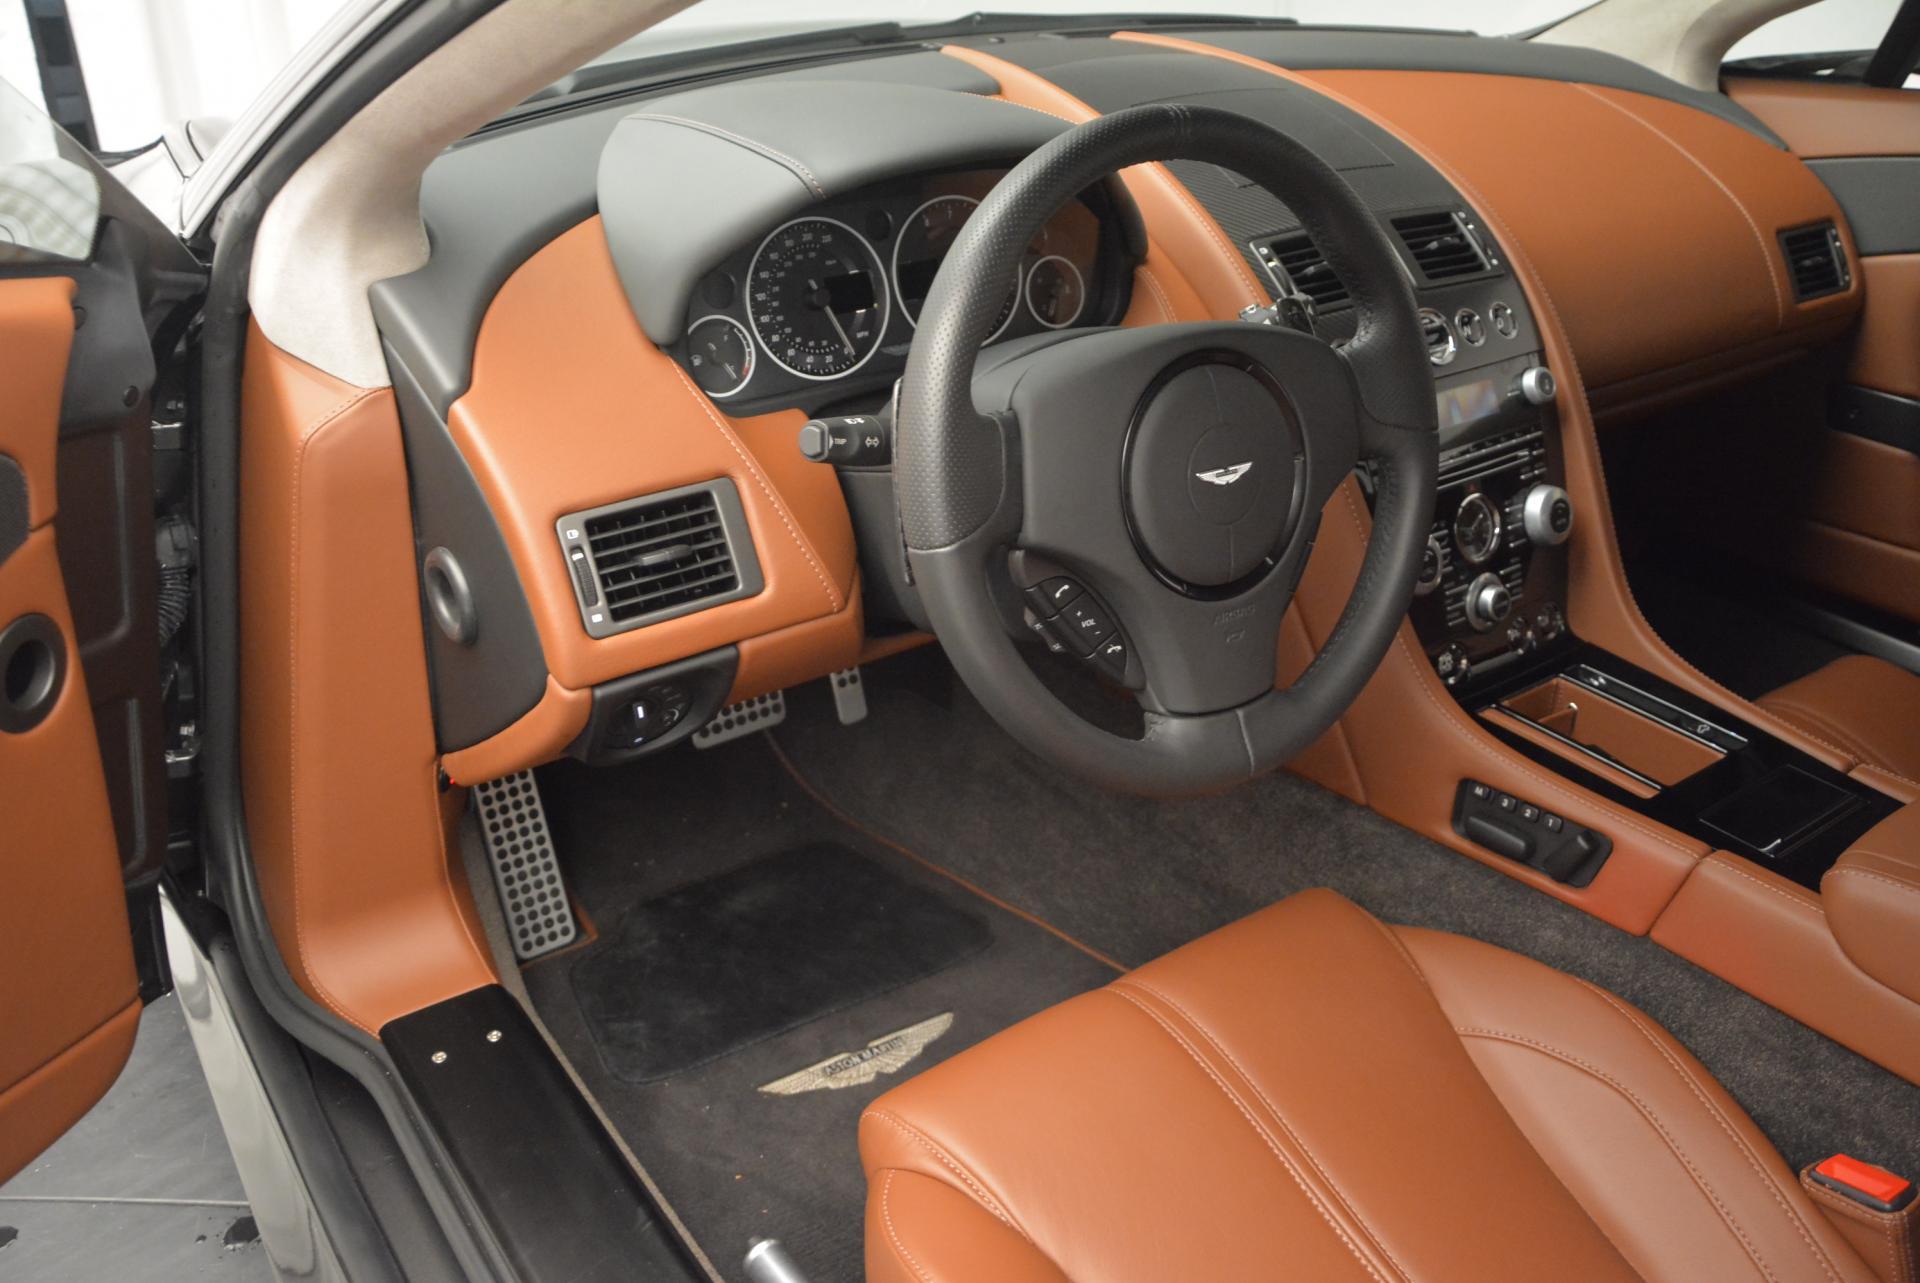 Used 2015 Aston Martin V12 Vantage S  For Sale In Greenwich, CT. Alfa Romeo of Greenwich, 7003 101_p22